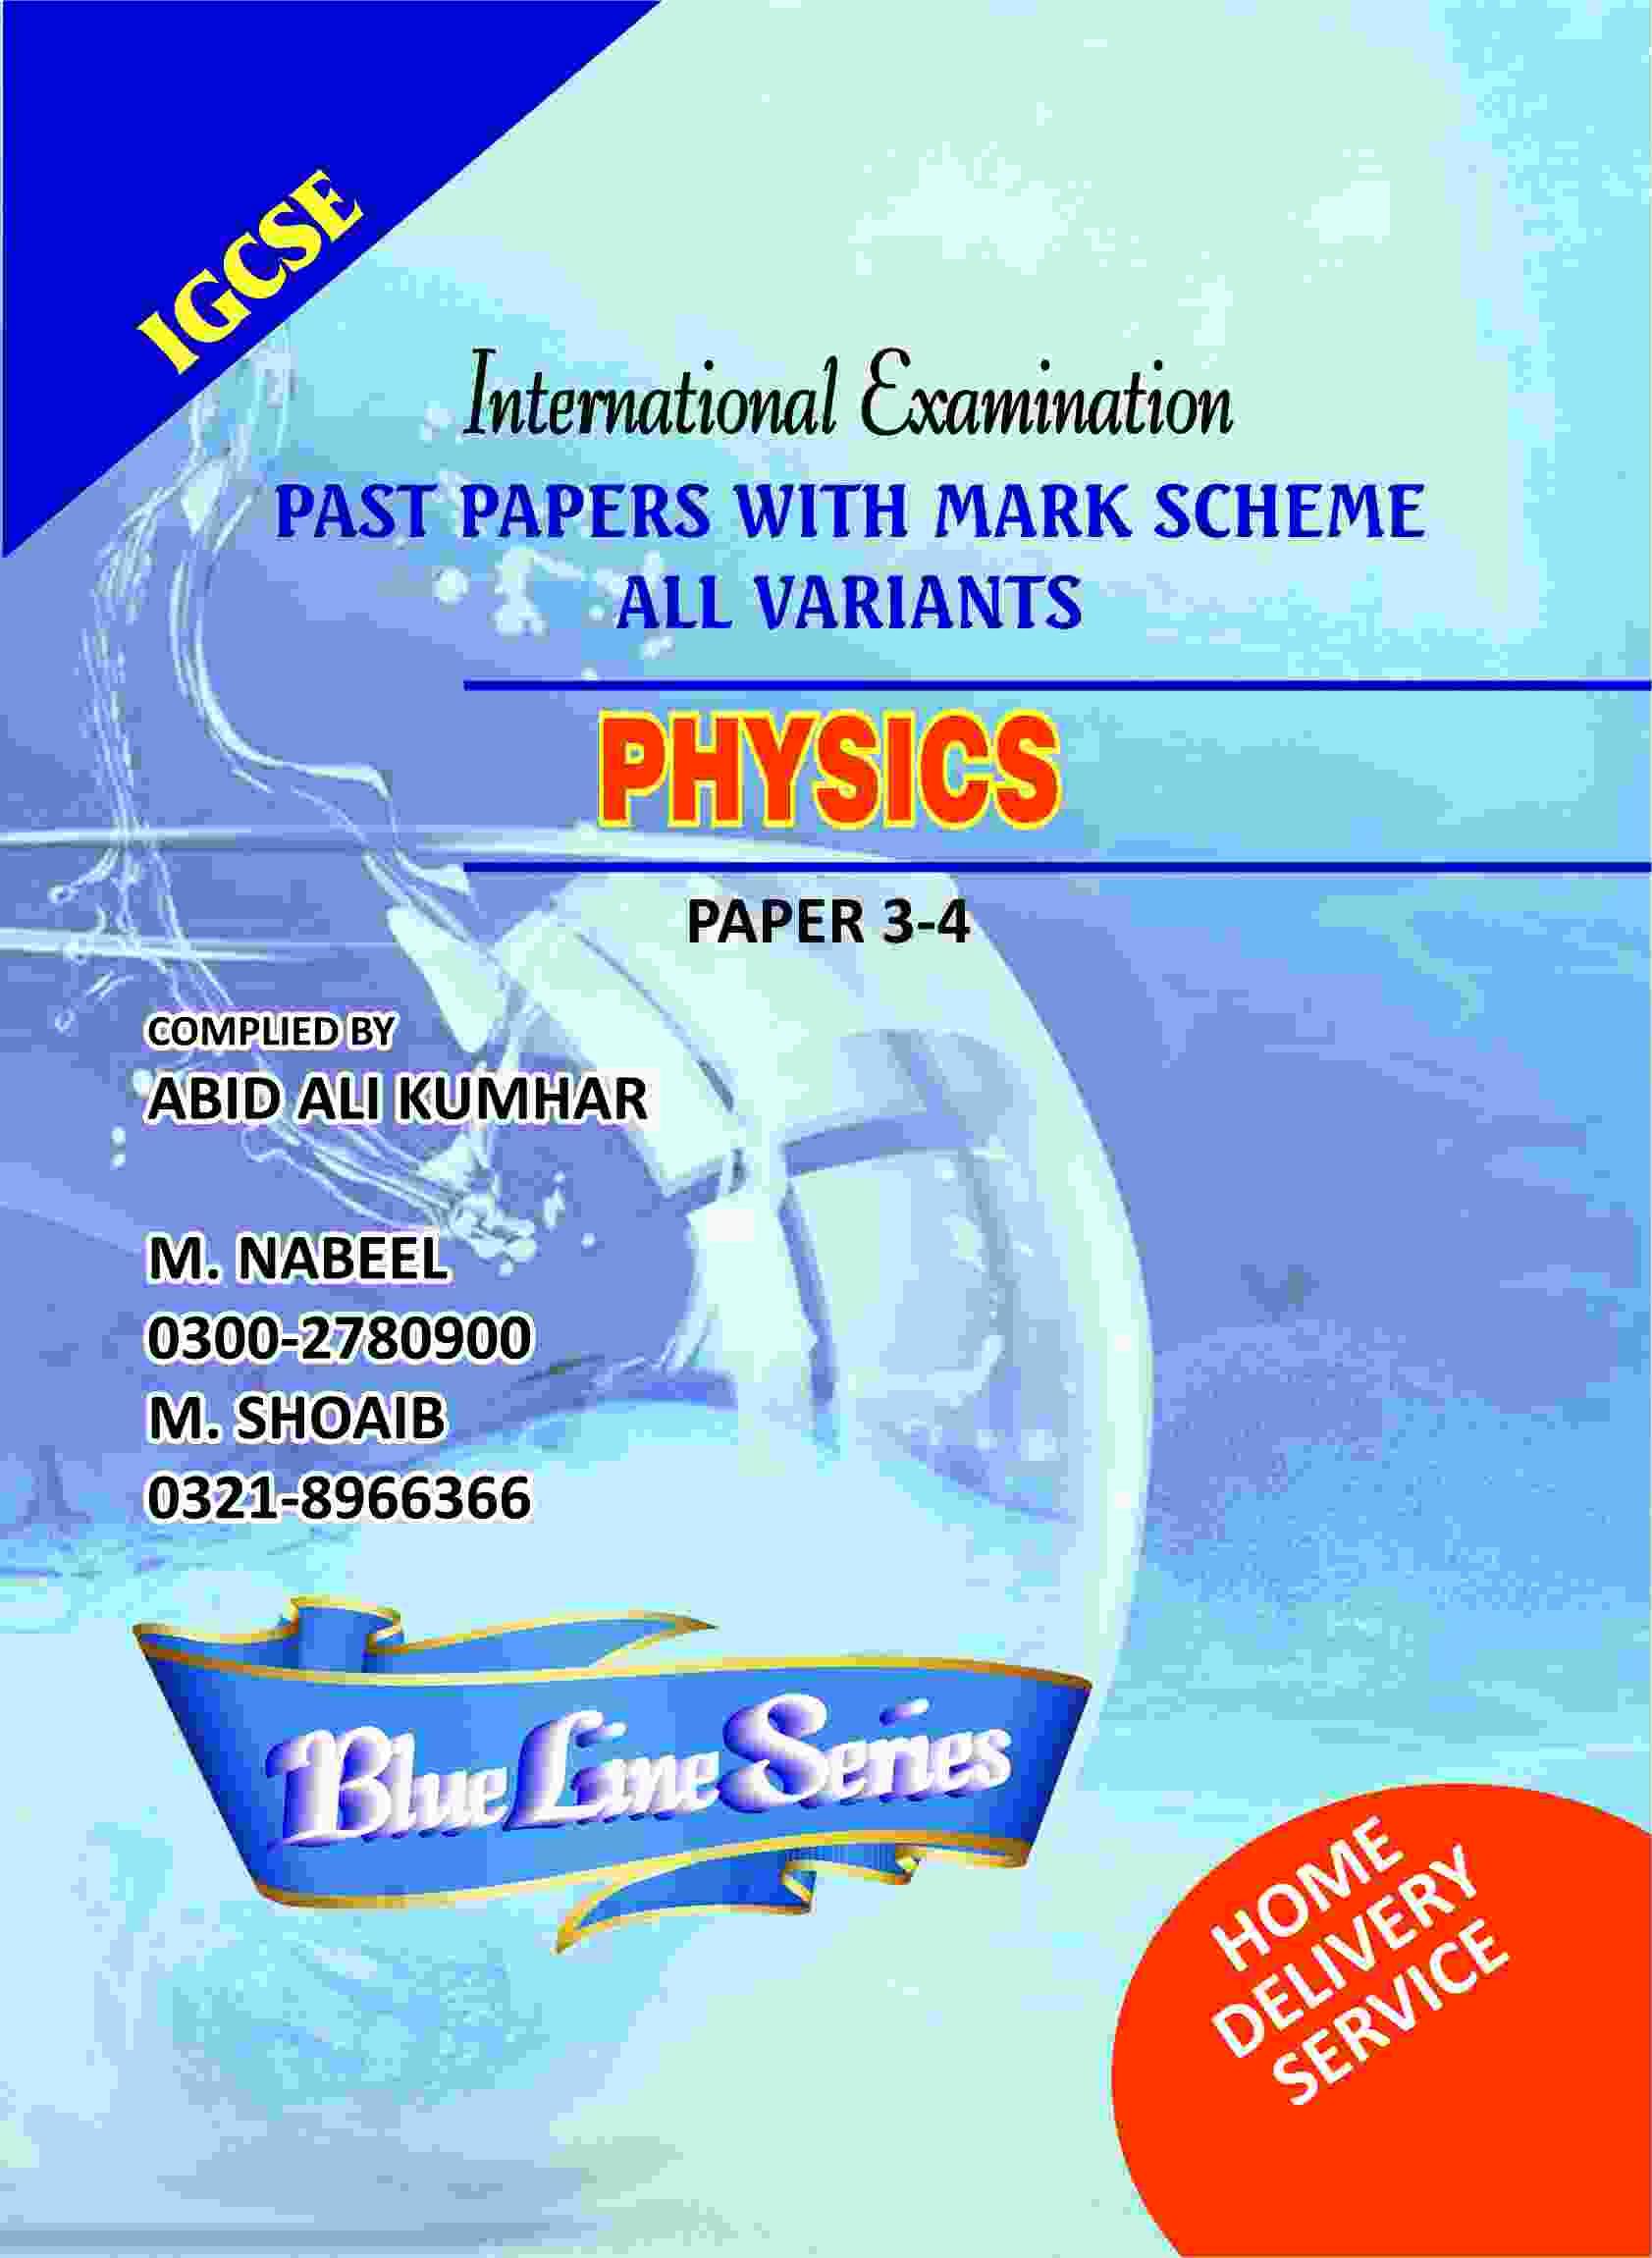 Igcse physics paper3-4